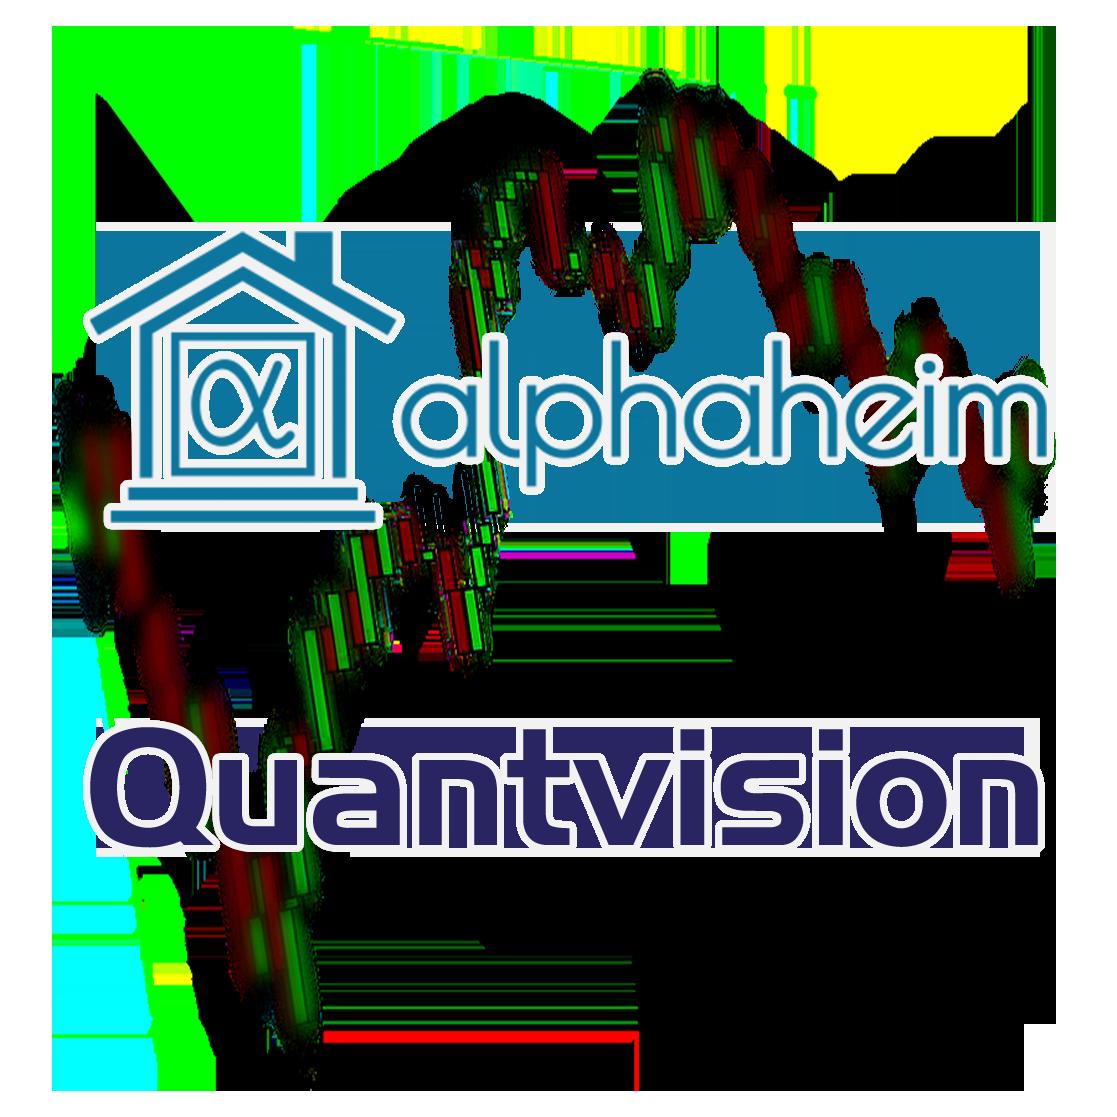 Quantvision alphaheim best indicators expert advisors dashboard for metatrader 4 and metatrader 5